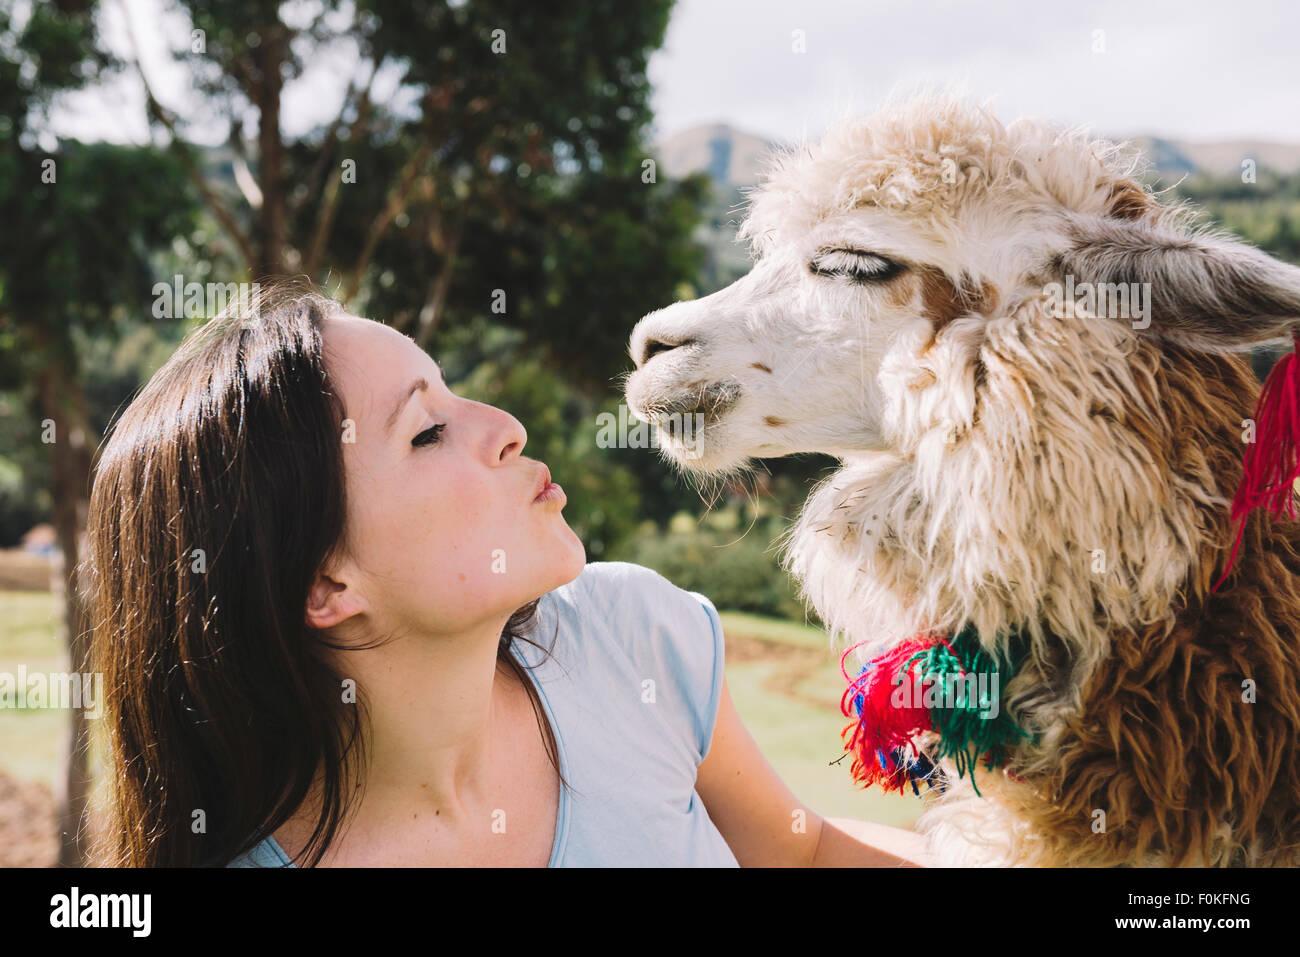 Peru, Cusco, young woman face to face to an alpaca - Stock Image